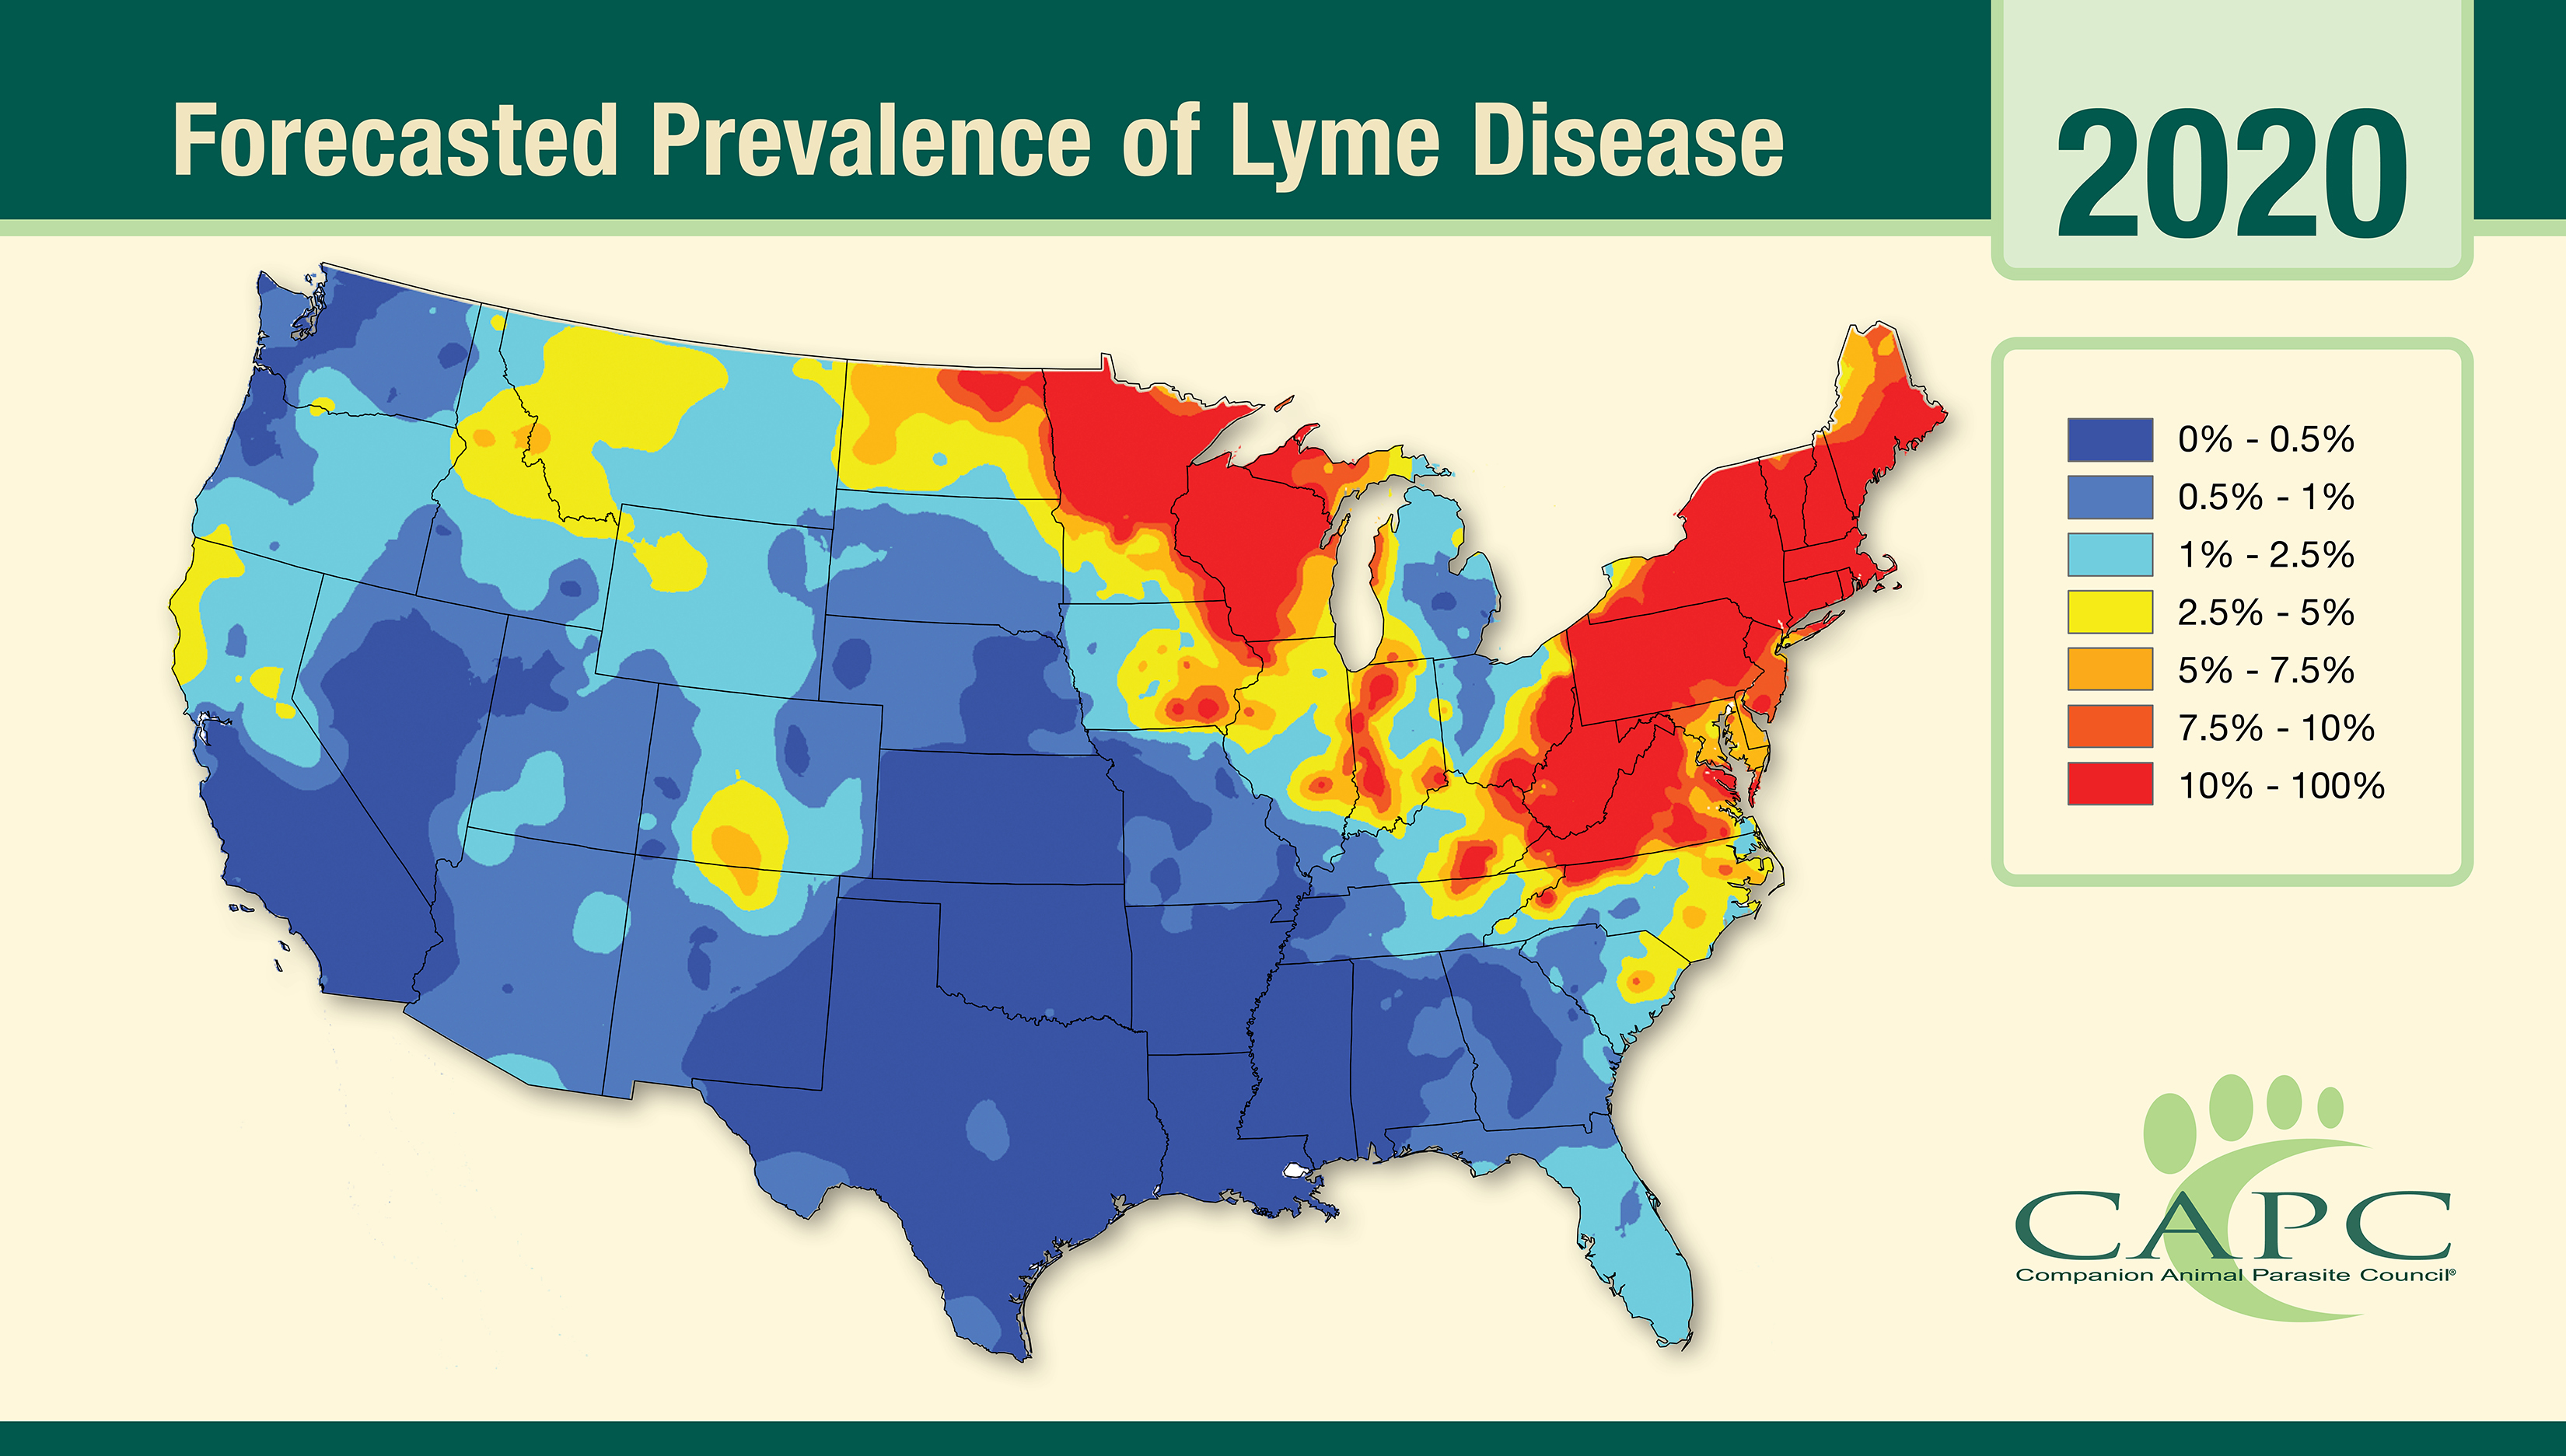 2020 Capc Forecast Maps Lyme